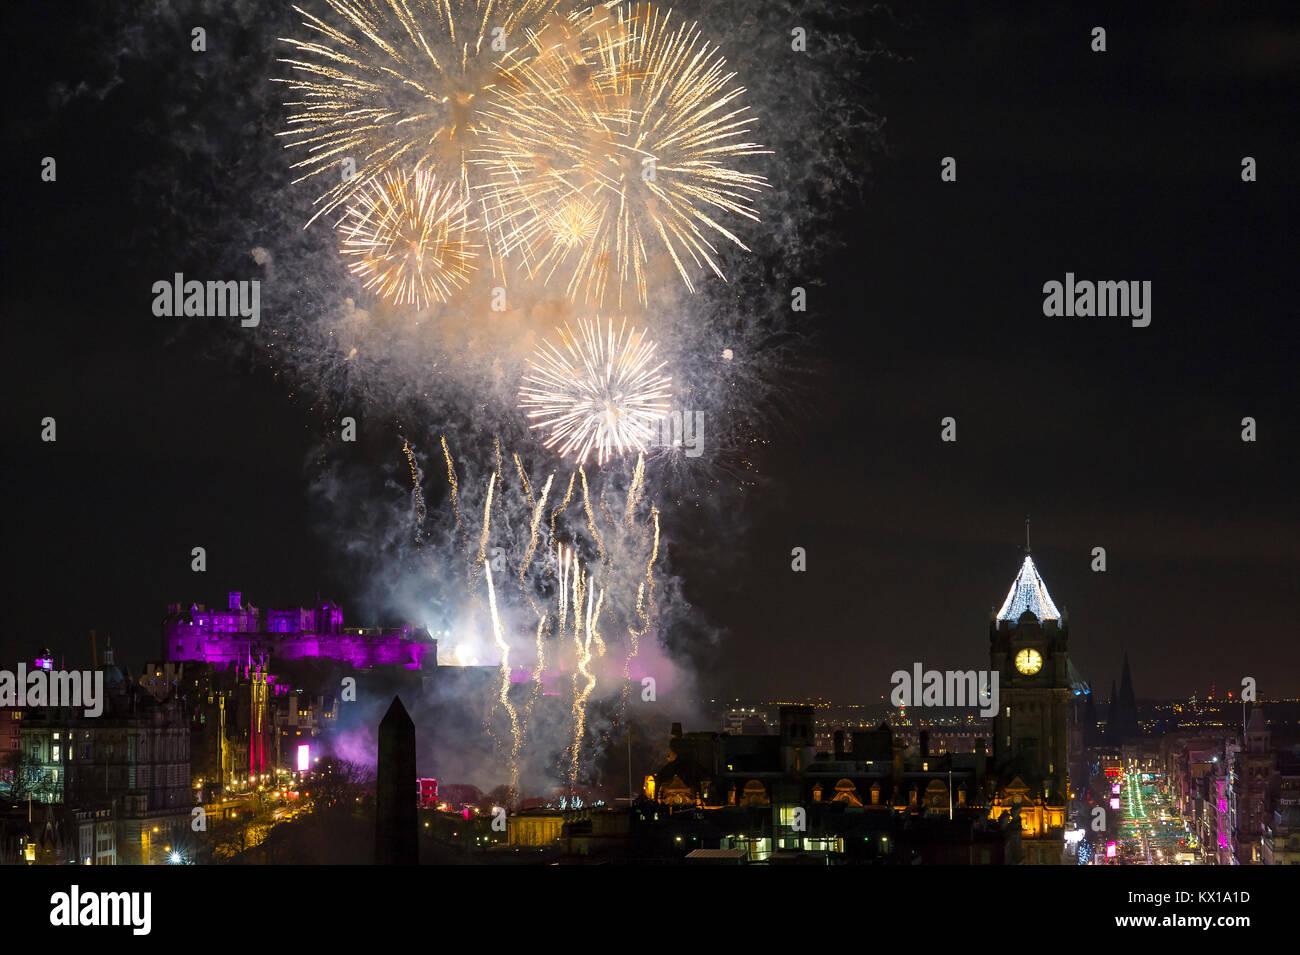 Firework display above Edinburgh Castle part of the 2018 Edinburgh new year celebrations. - Stock Image